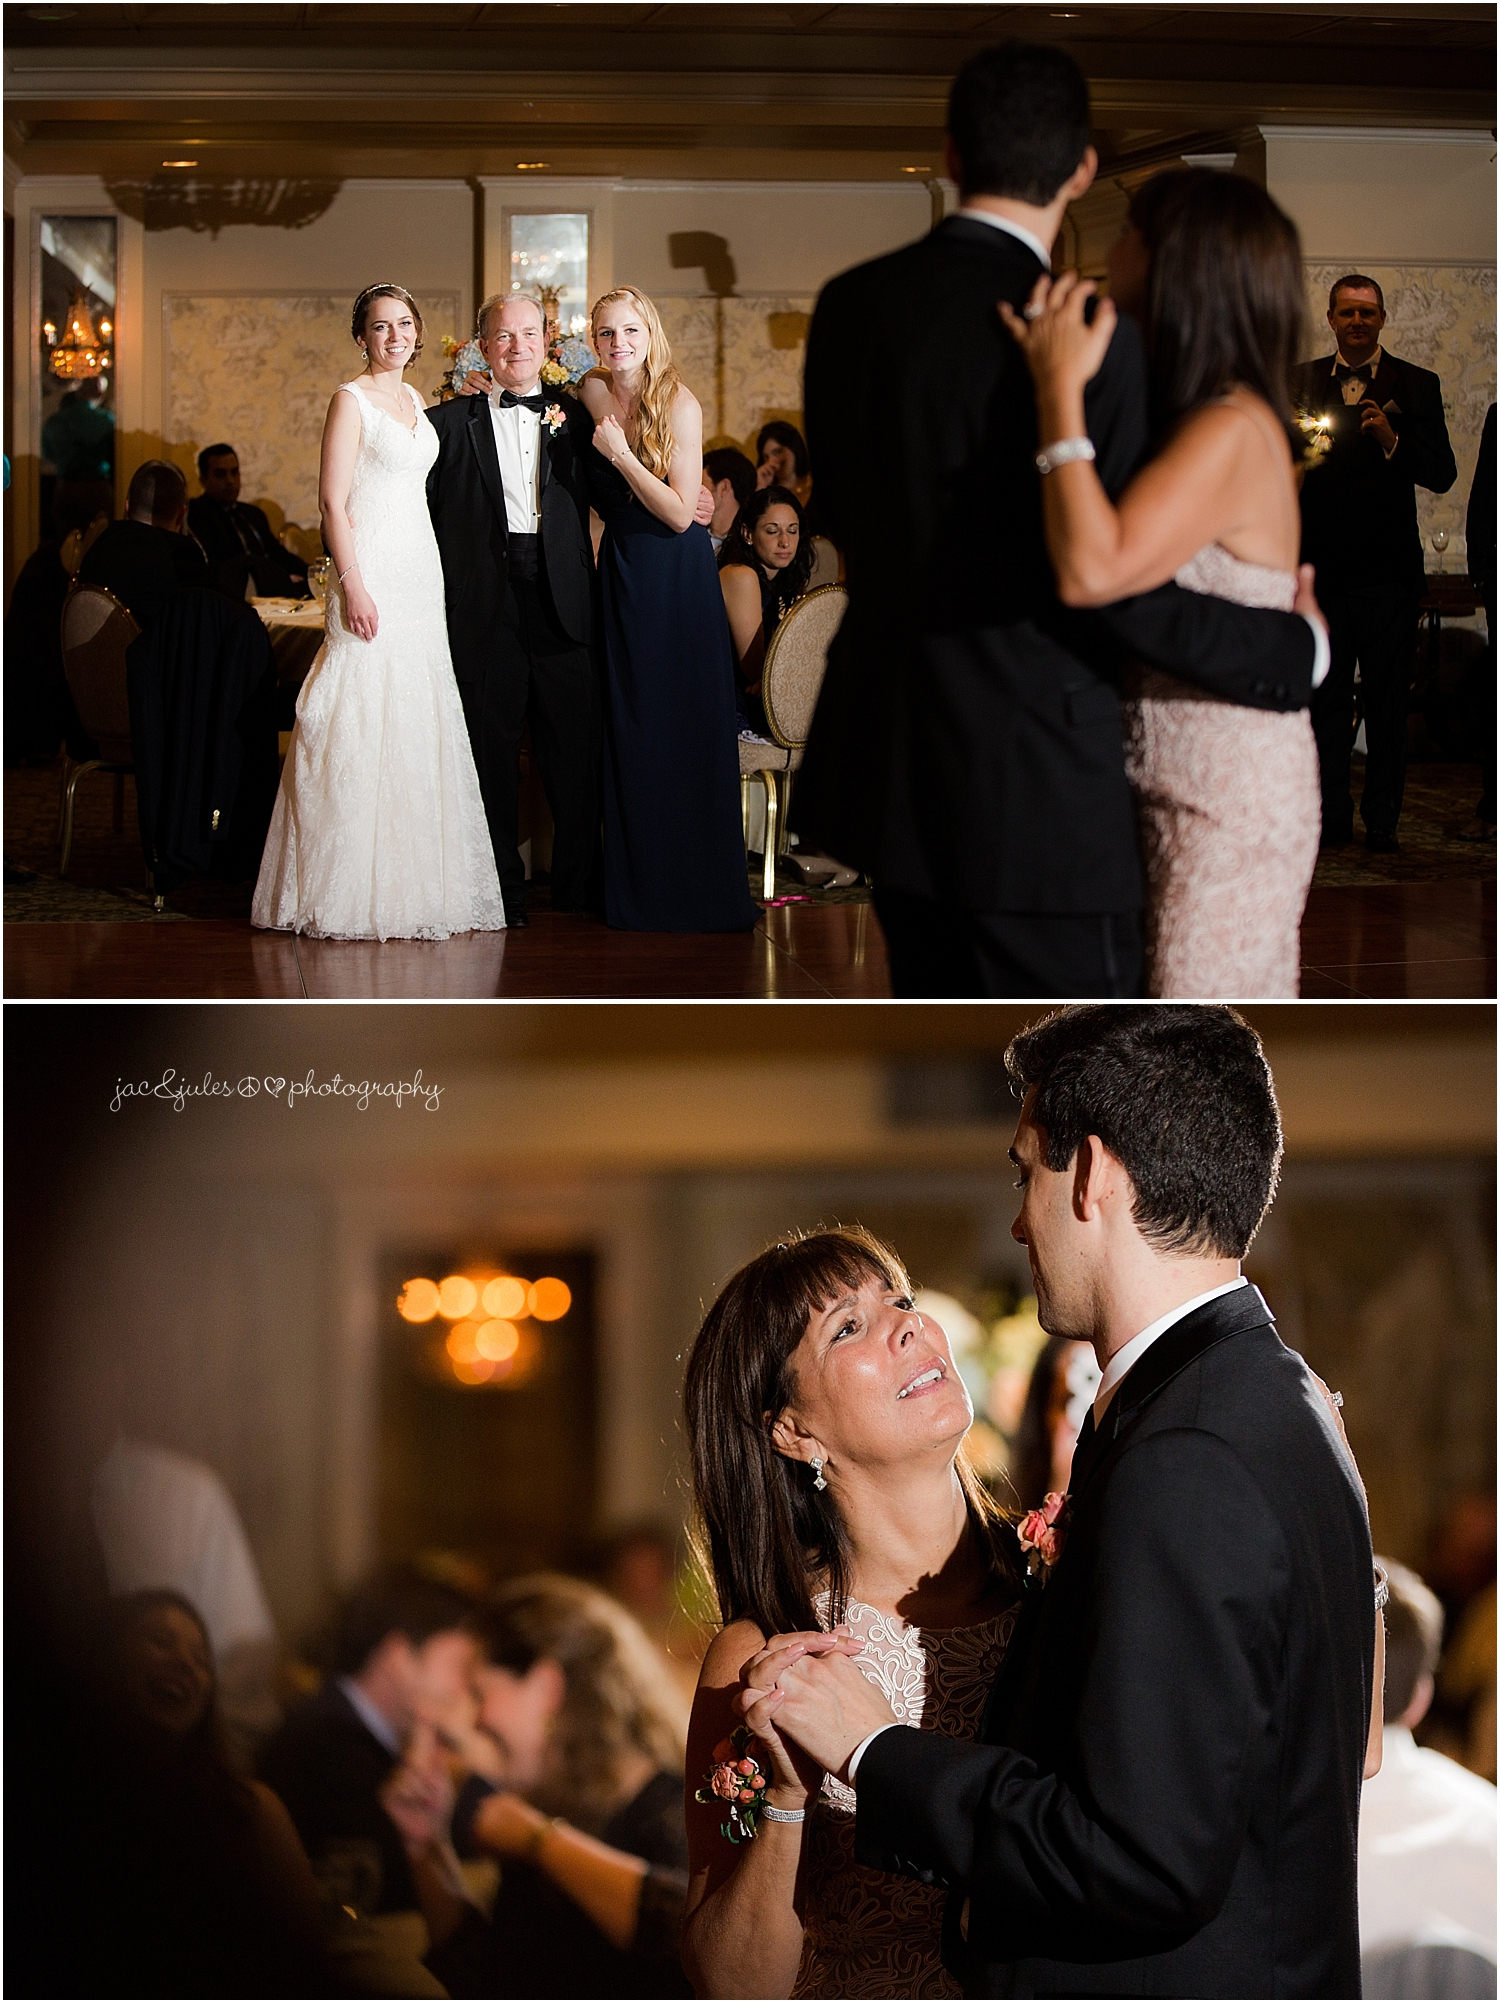 jacnjules photograph parent dances at their wedding reception at olde mill inn in basking ridge nj